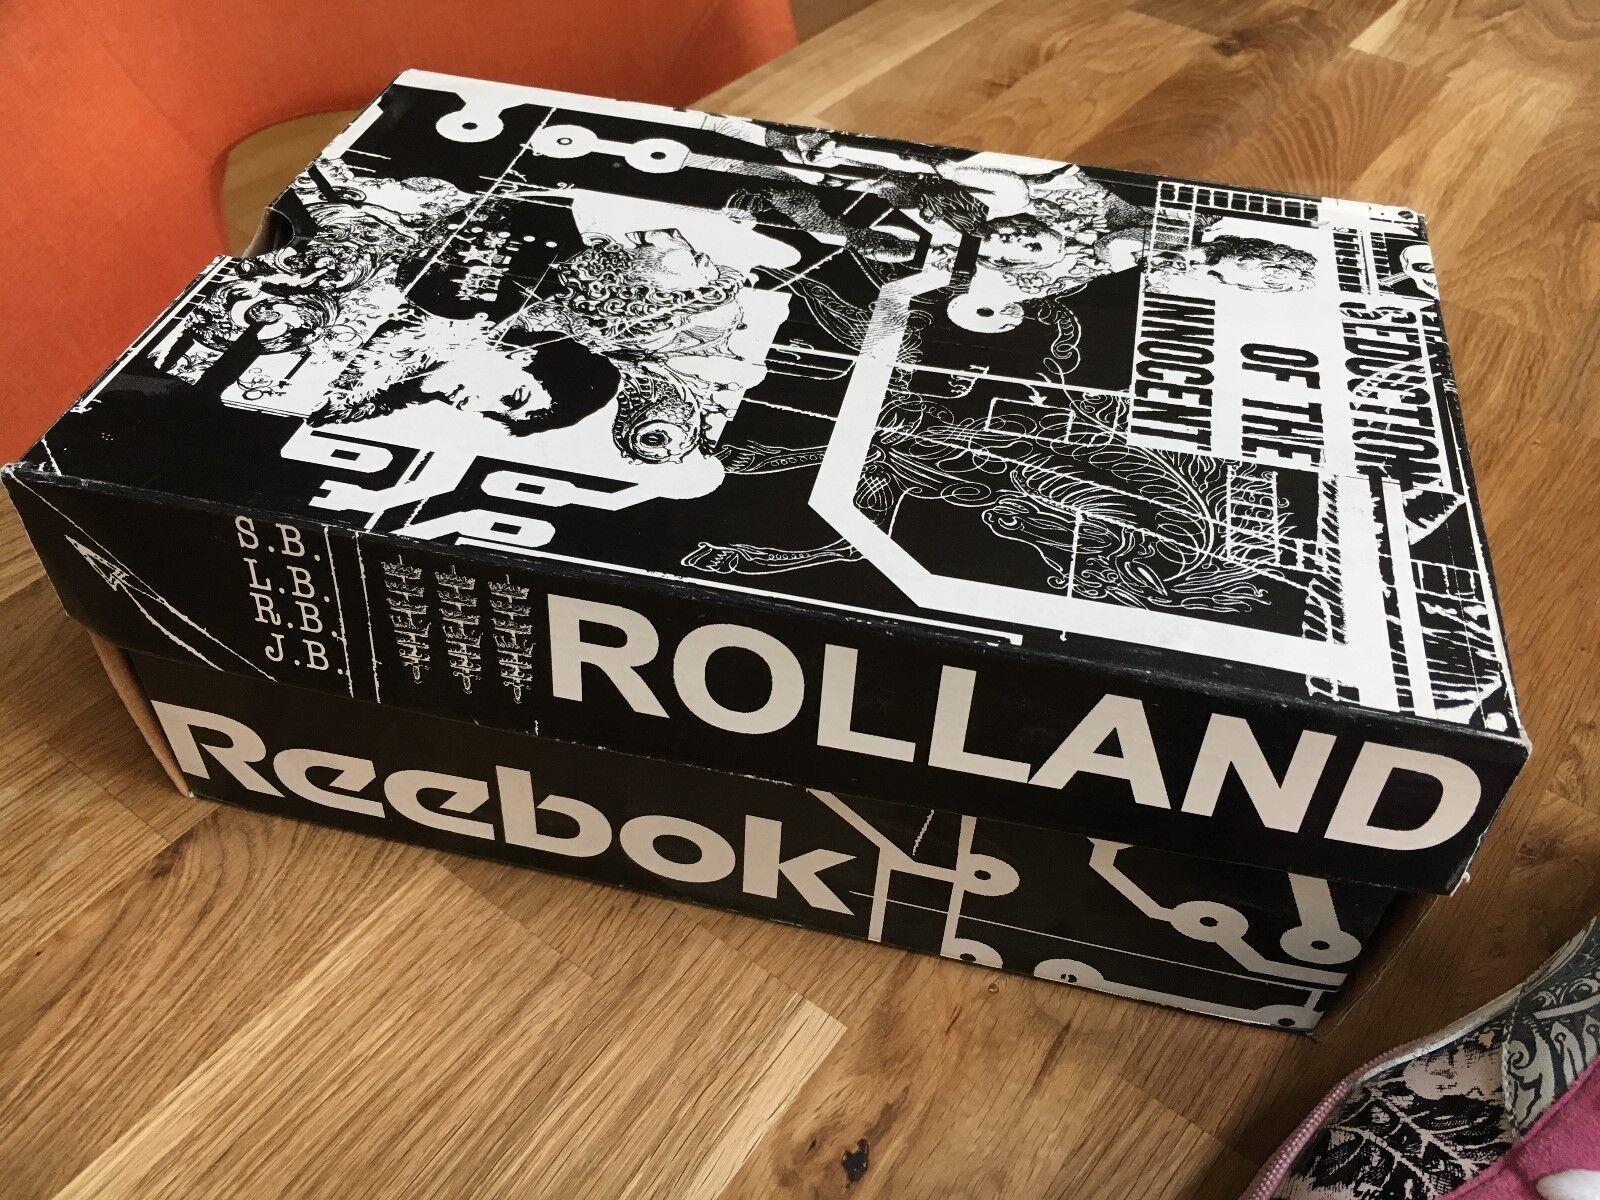 Reebok Sneakers - extrem coole Designer GR. Schuhe von Rolland Berry GR. Designer 44,5 28a1c0